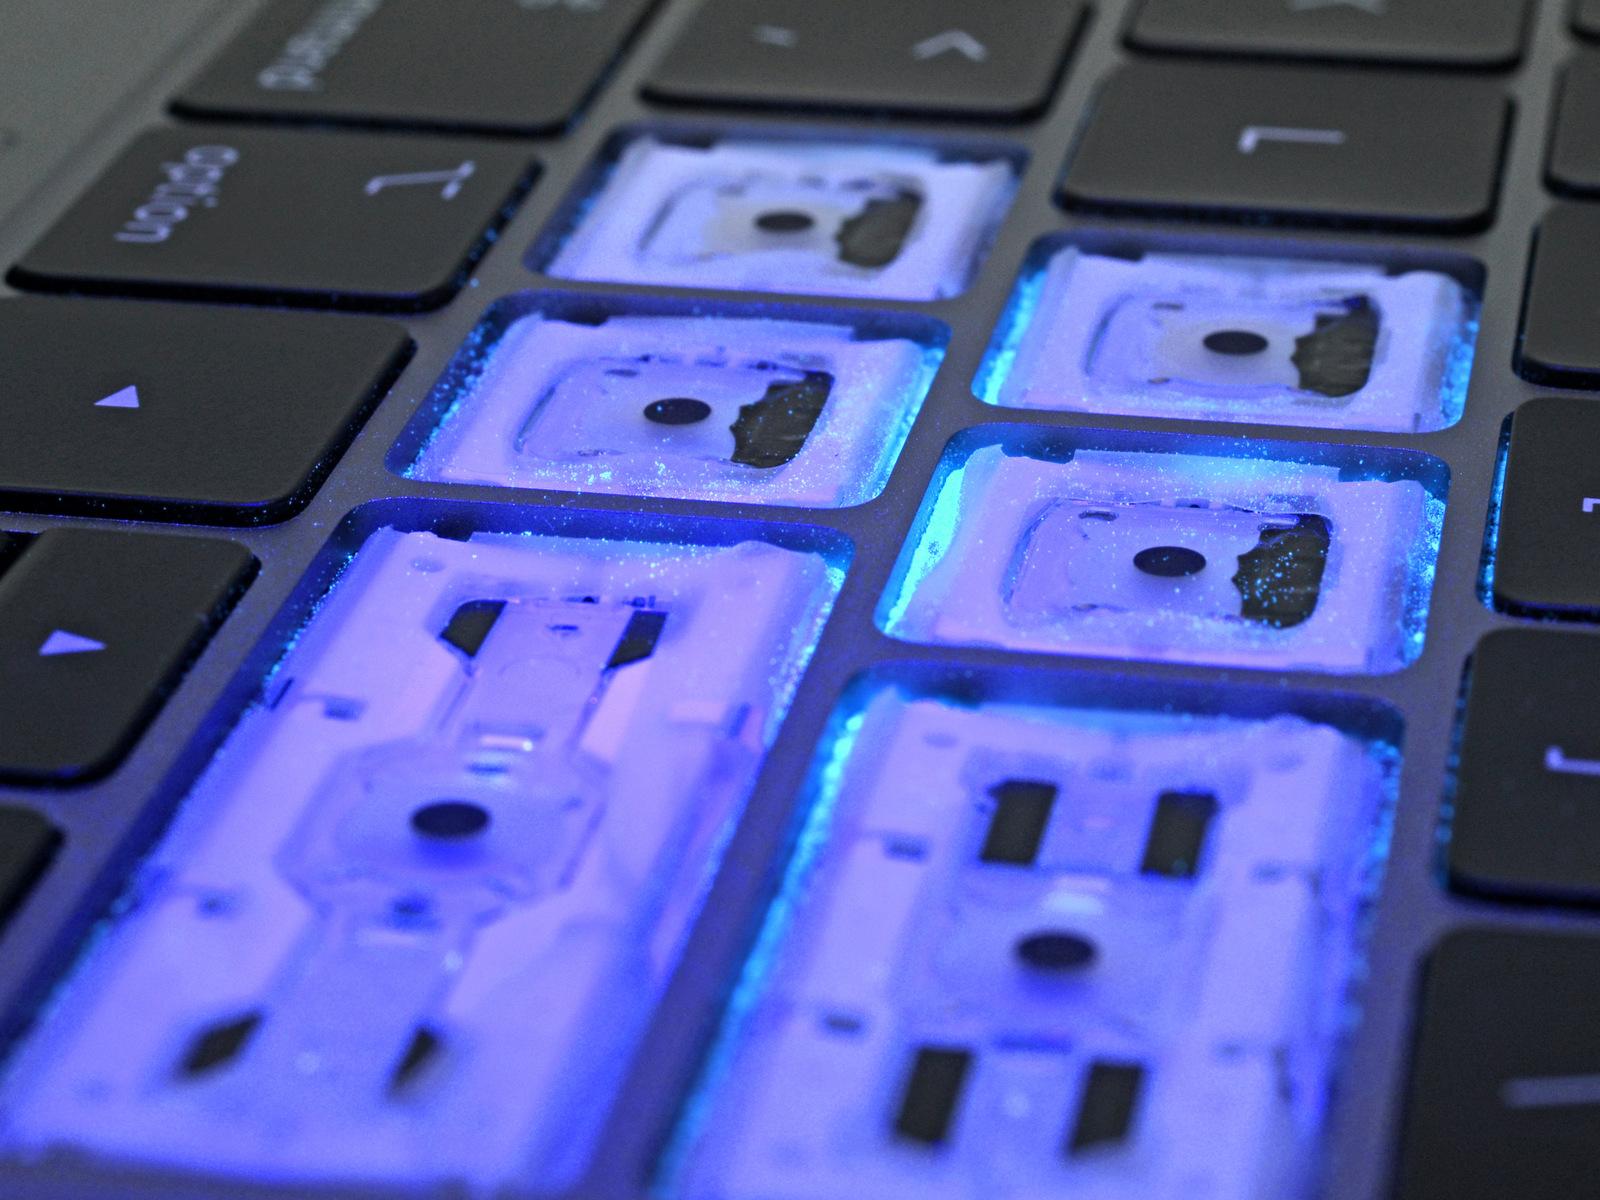 iFixit testa o teclado e a membrana de silicone do novo MacBook Pro